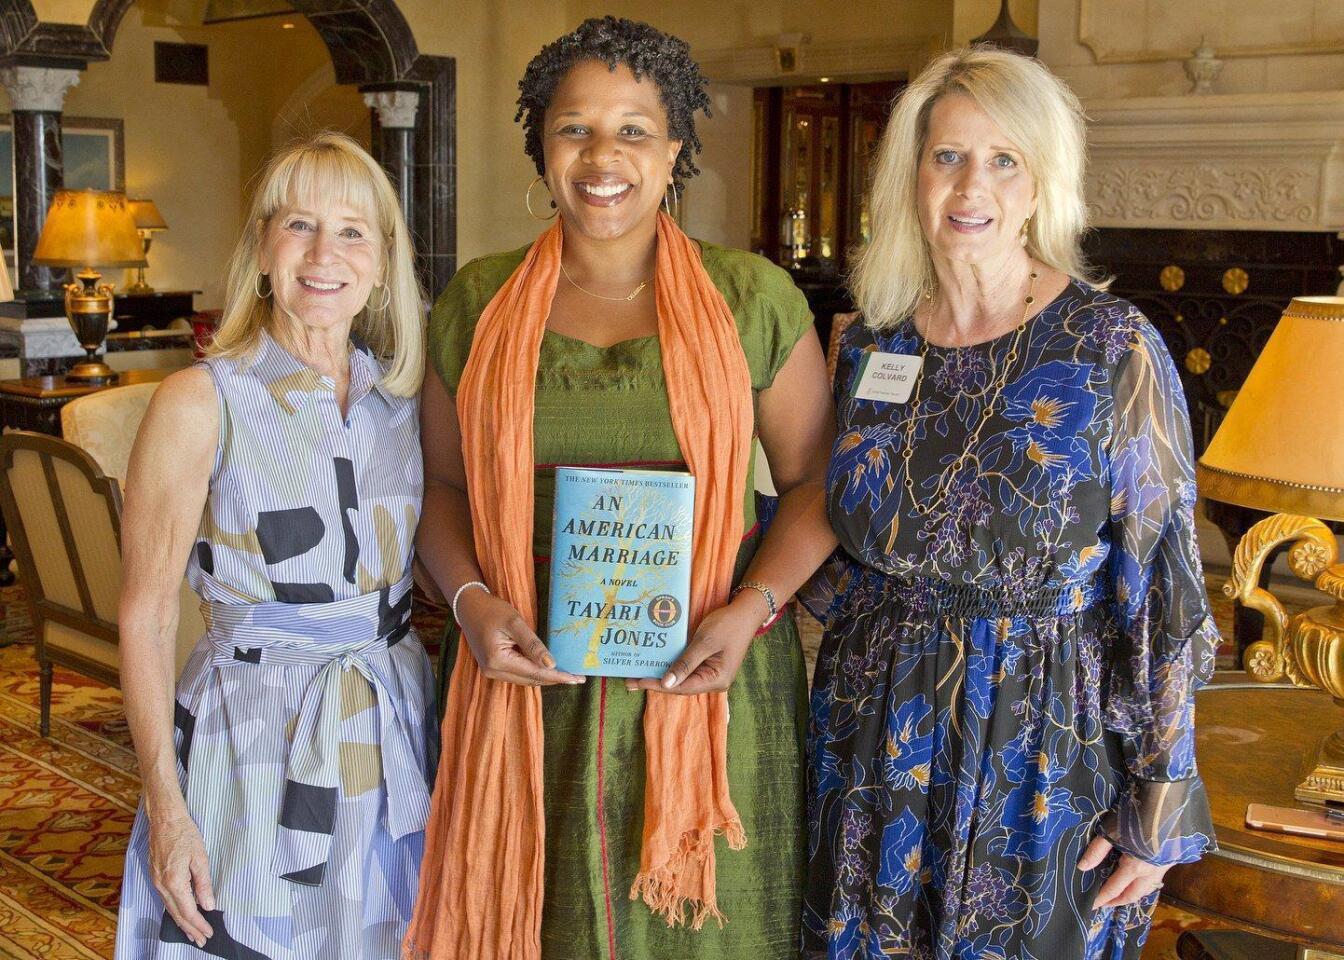 RSF Literary Society presents author Tayari Jones